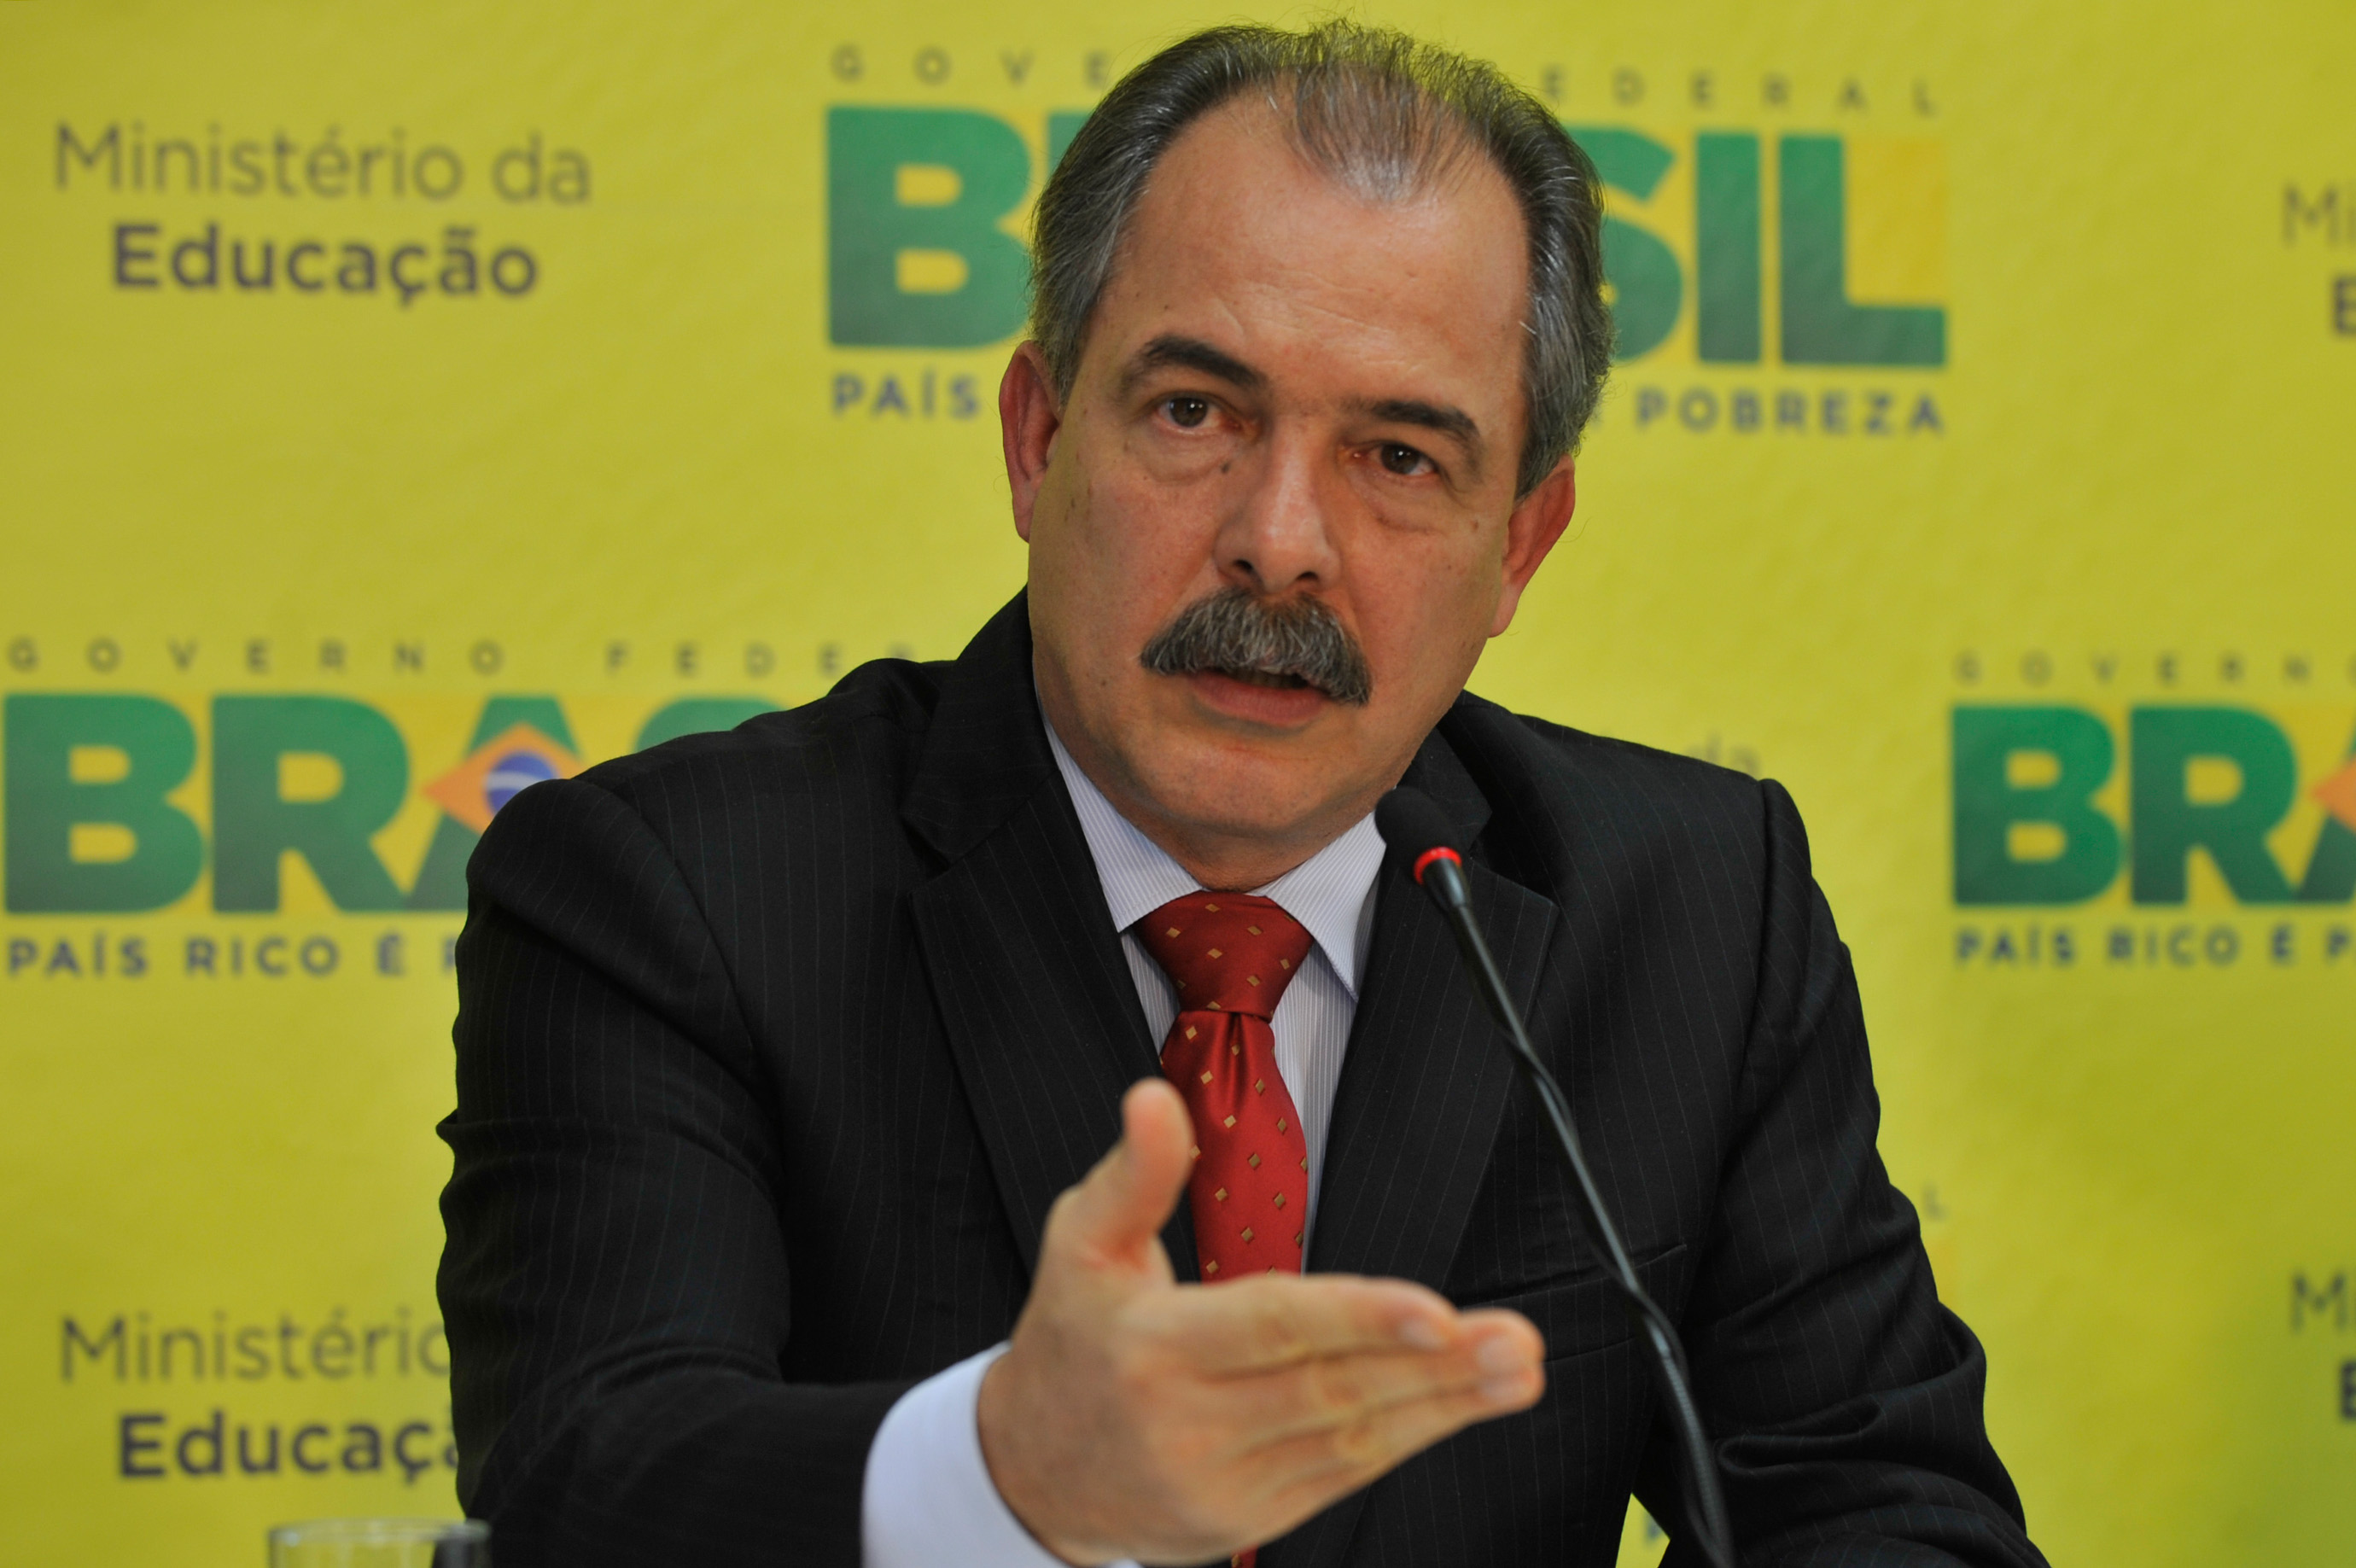 O ministro da Educação, Aloizio Mercadante (Foto: Valter Campanato/ABr)